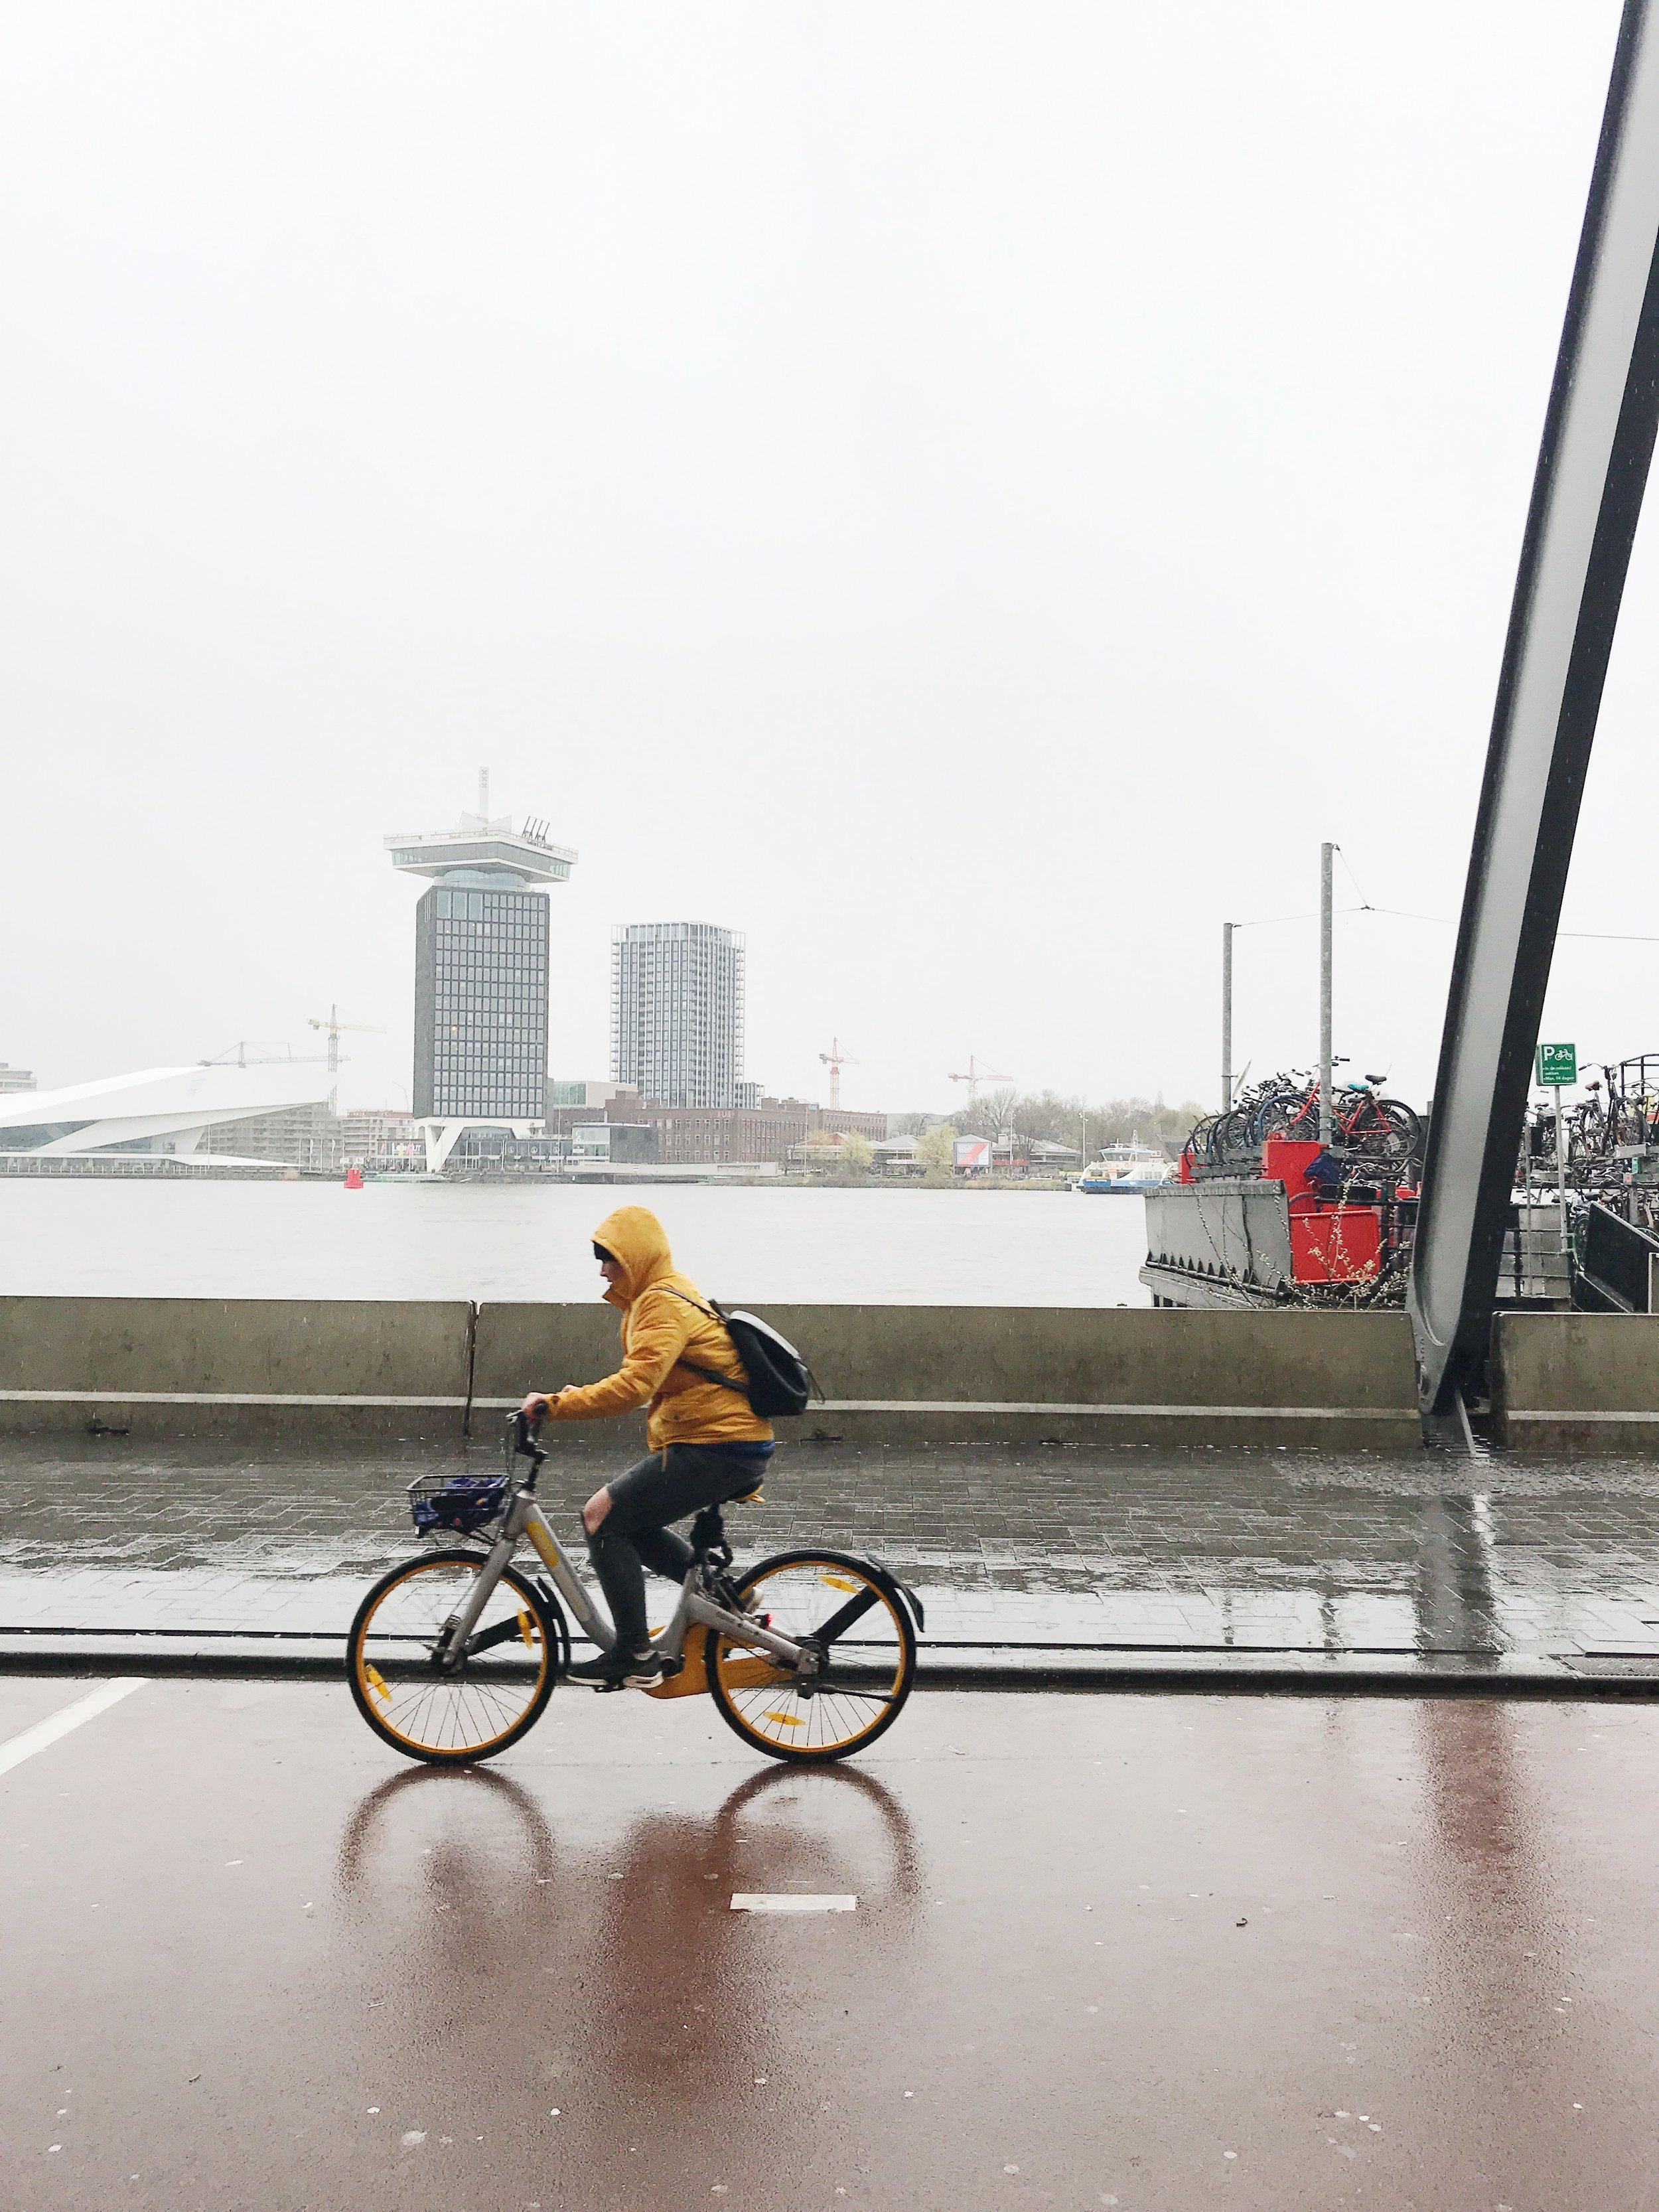 rain-coats-amsterdam-centraal